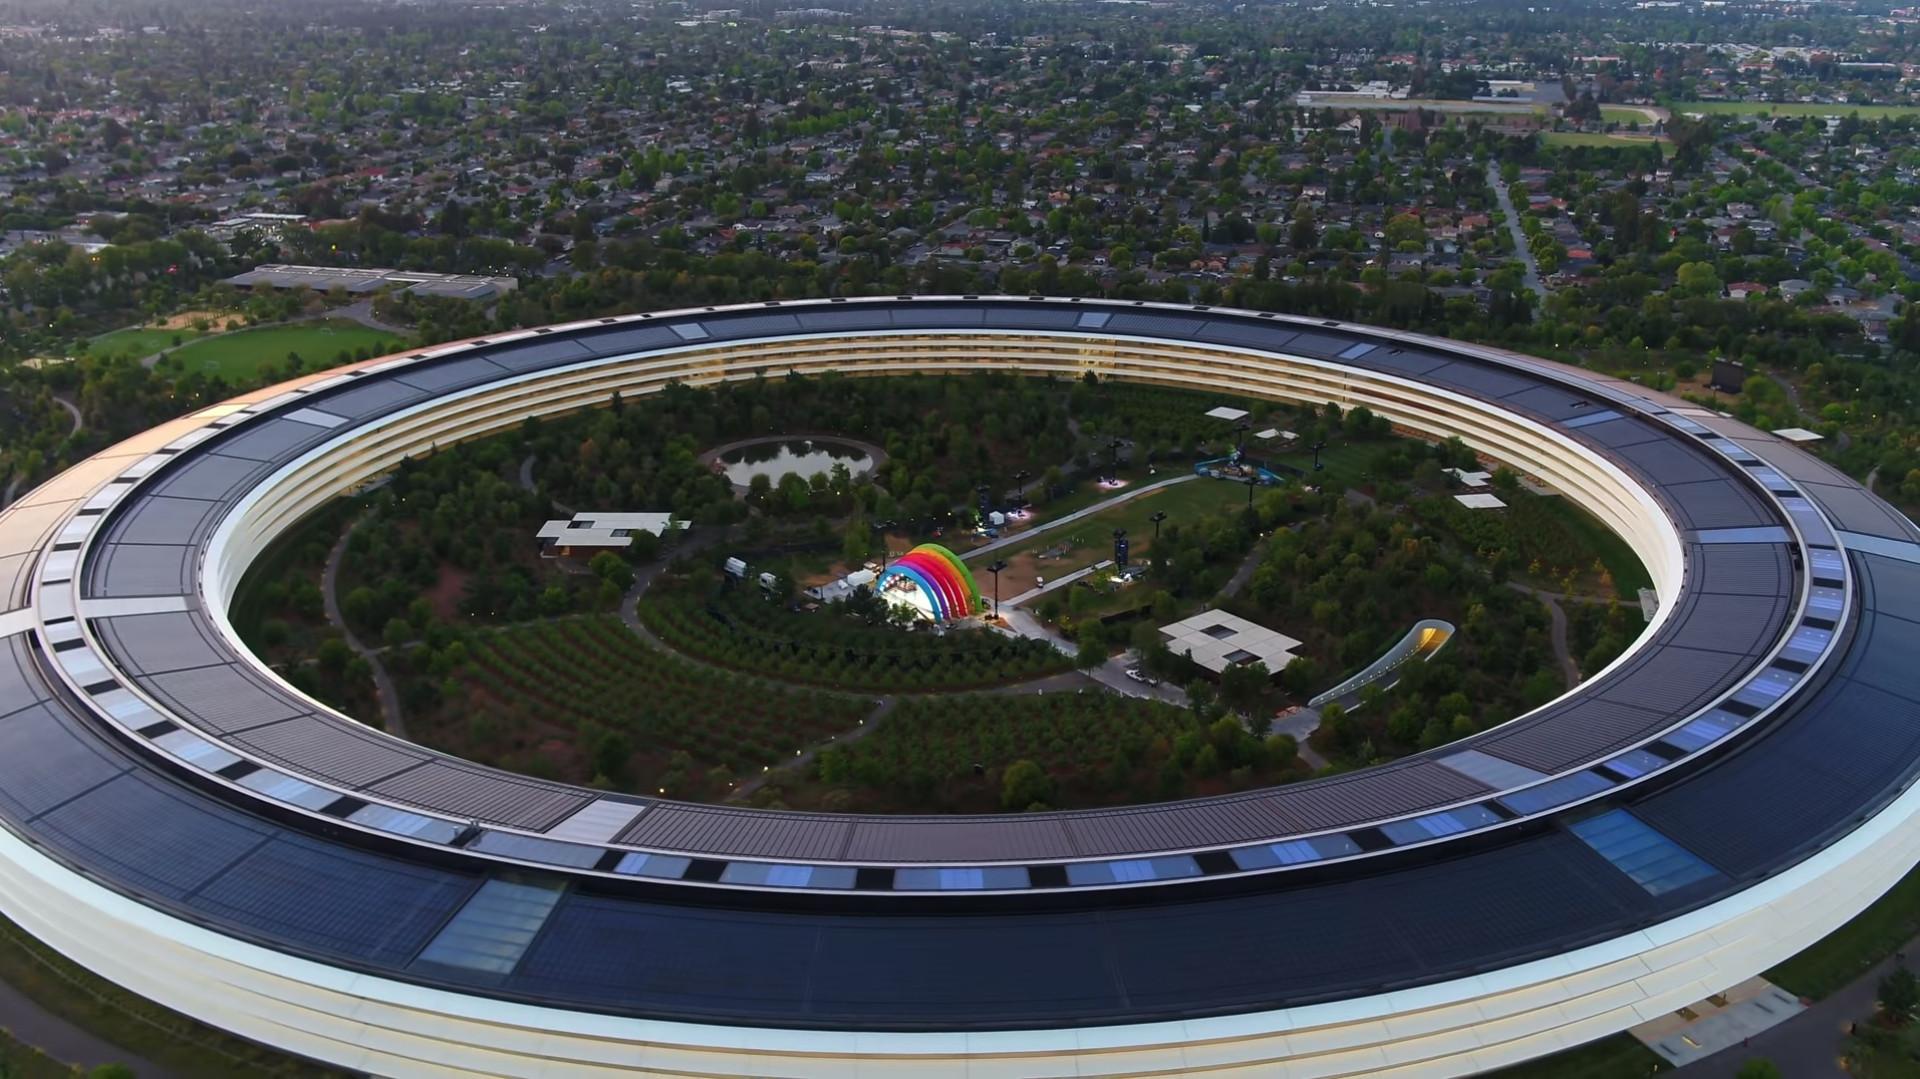 Drone revela misterioso palco no centro da sede da Apple